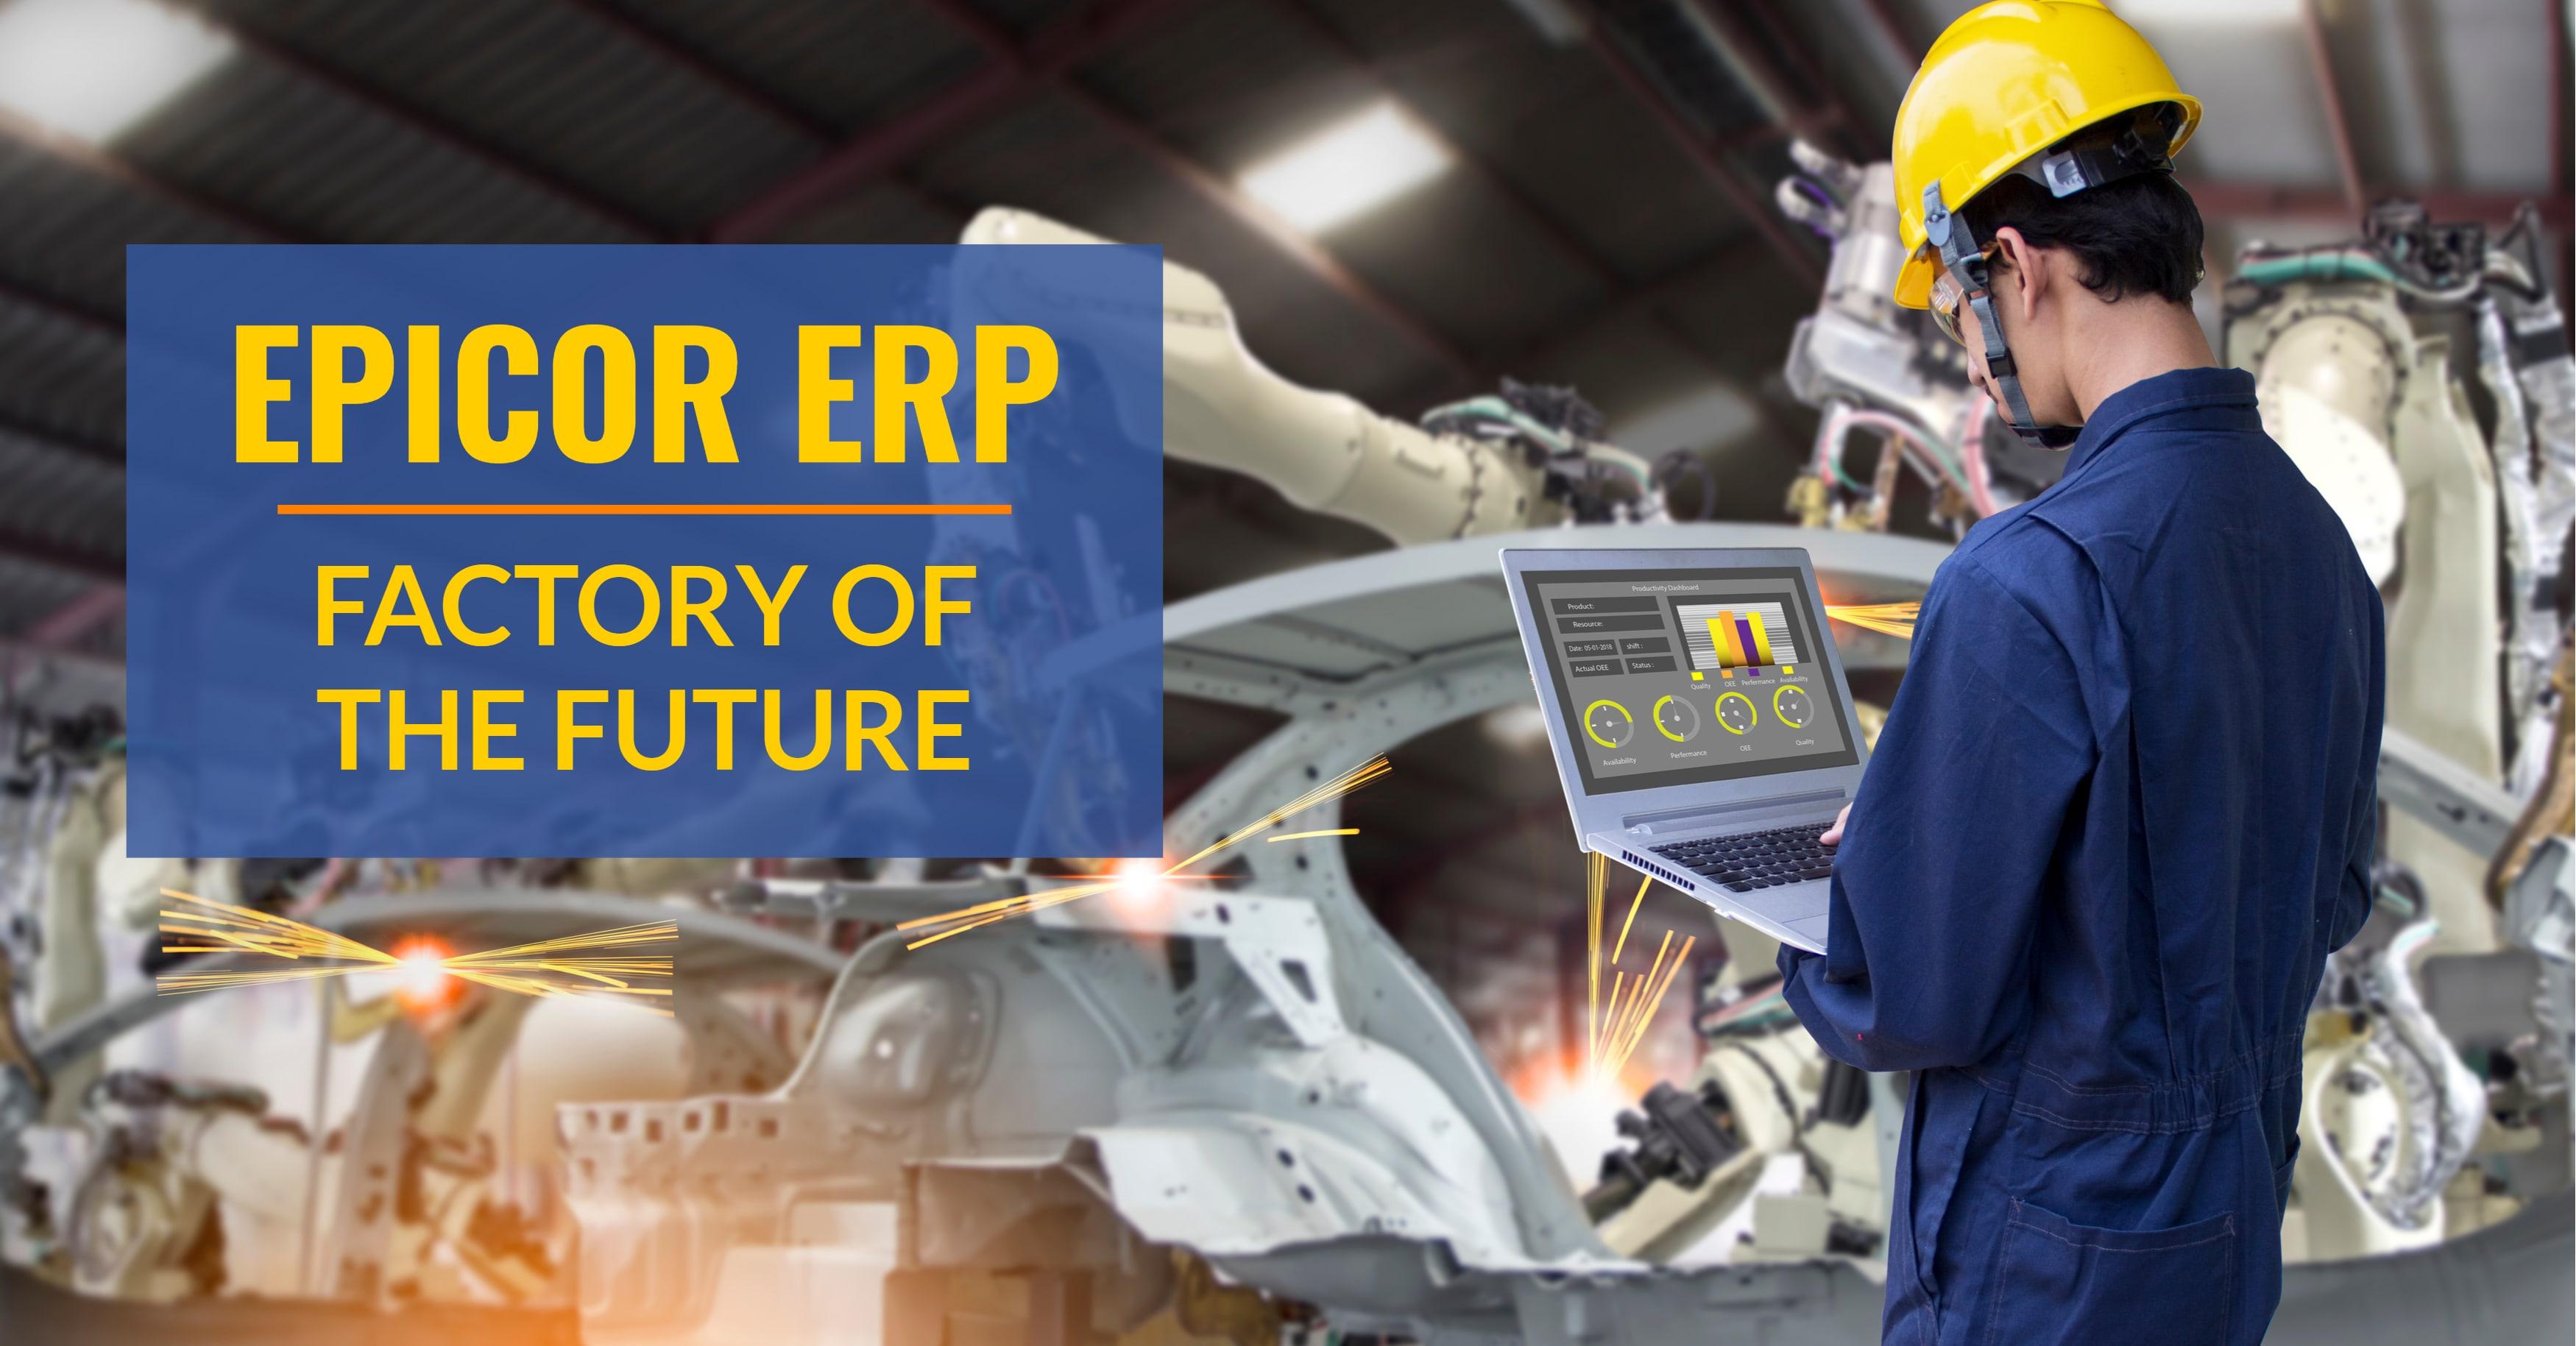 Epicor ERP Factory of the Future